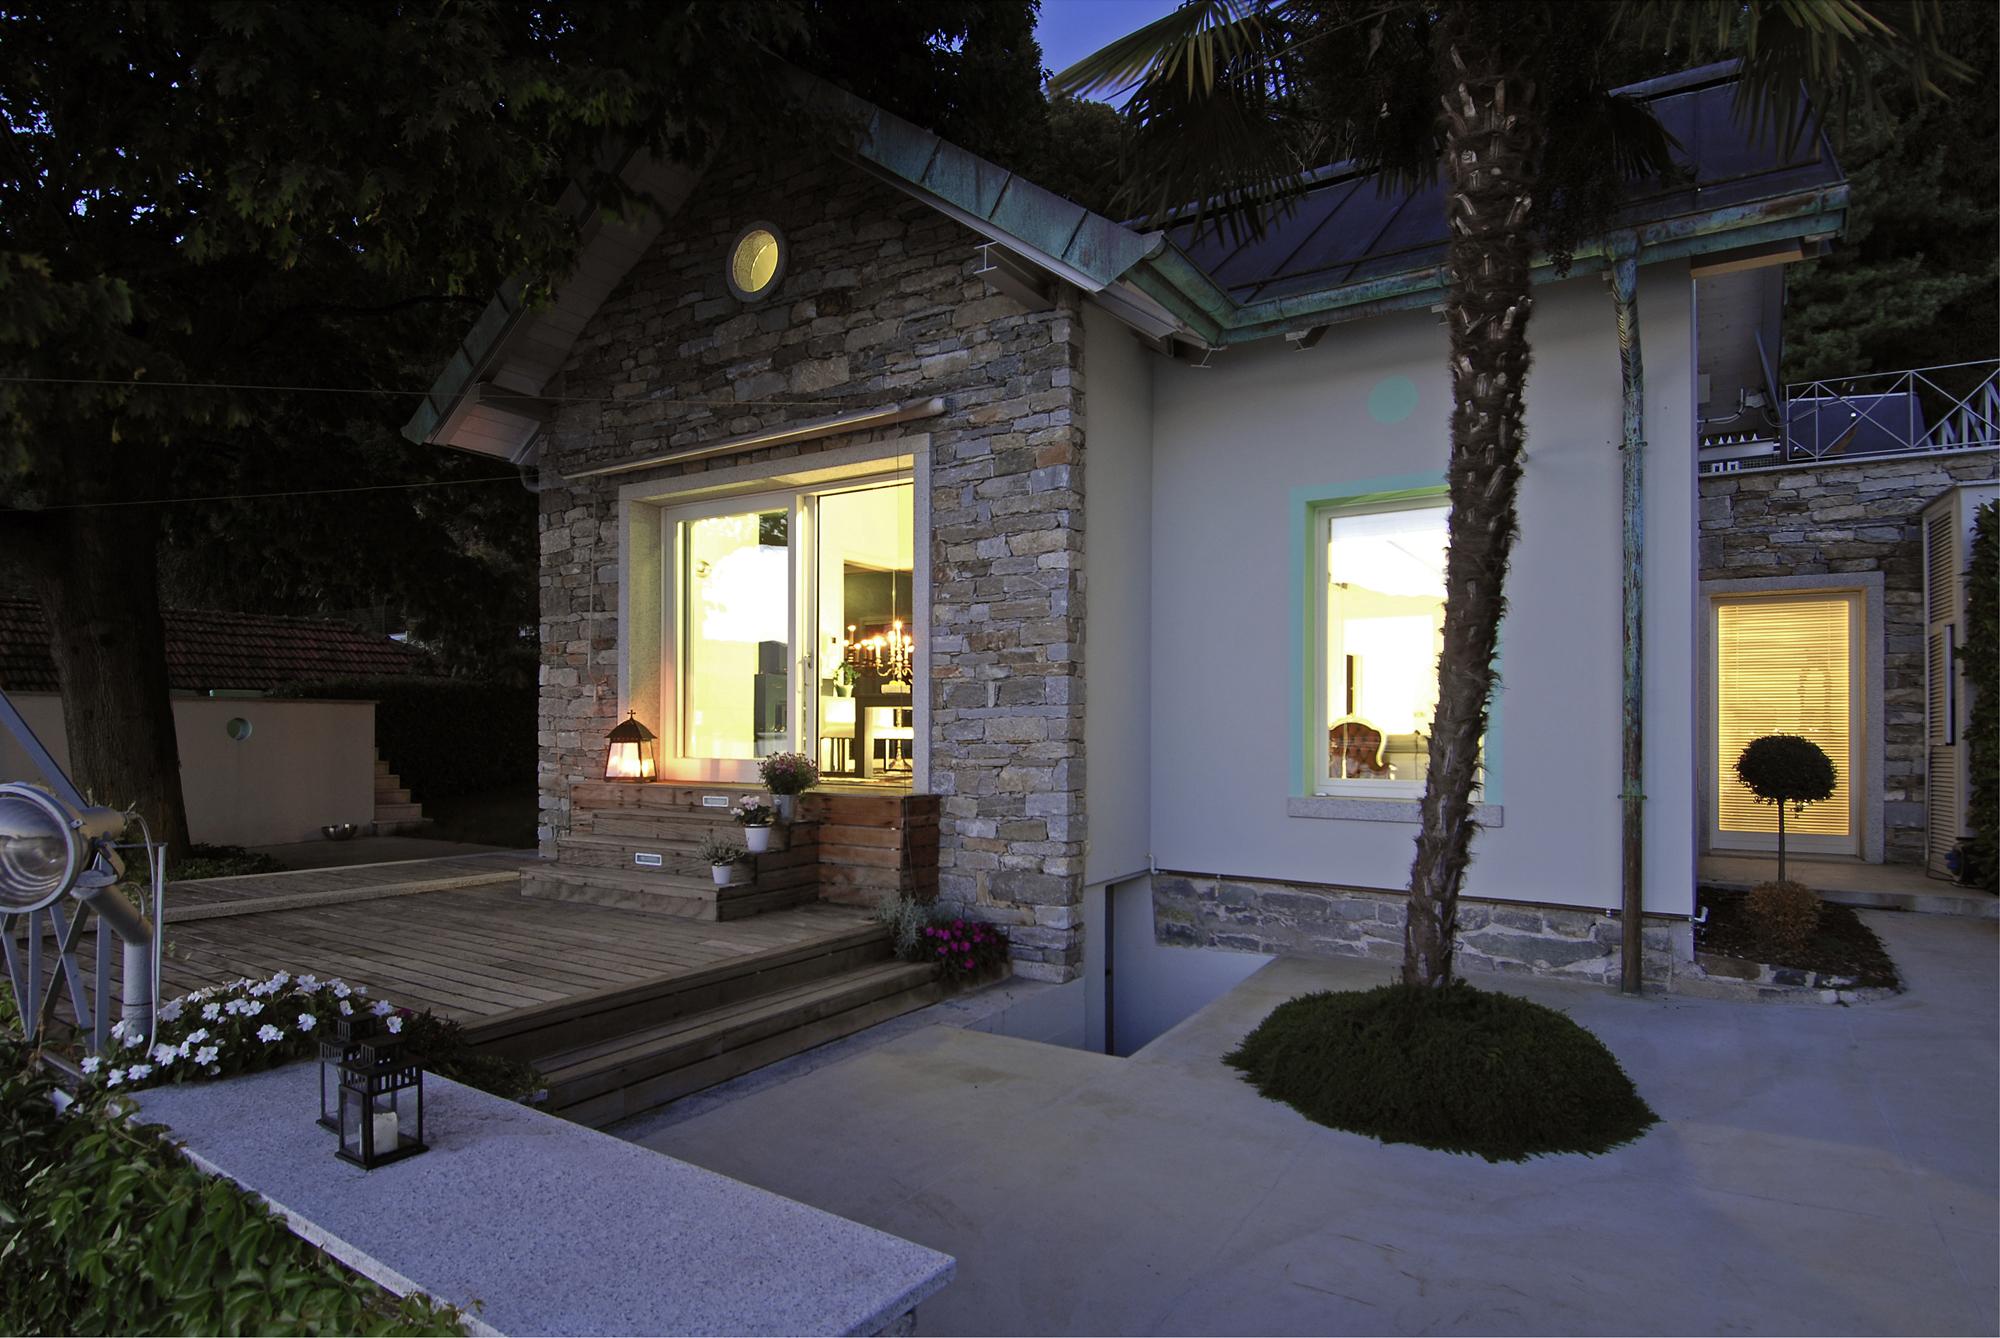 House on Orta's Lake